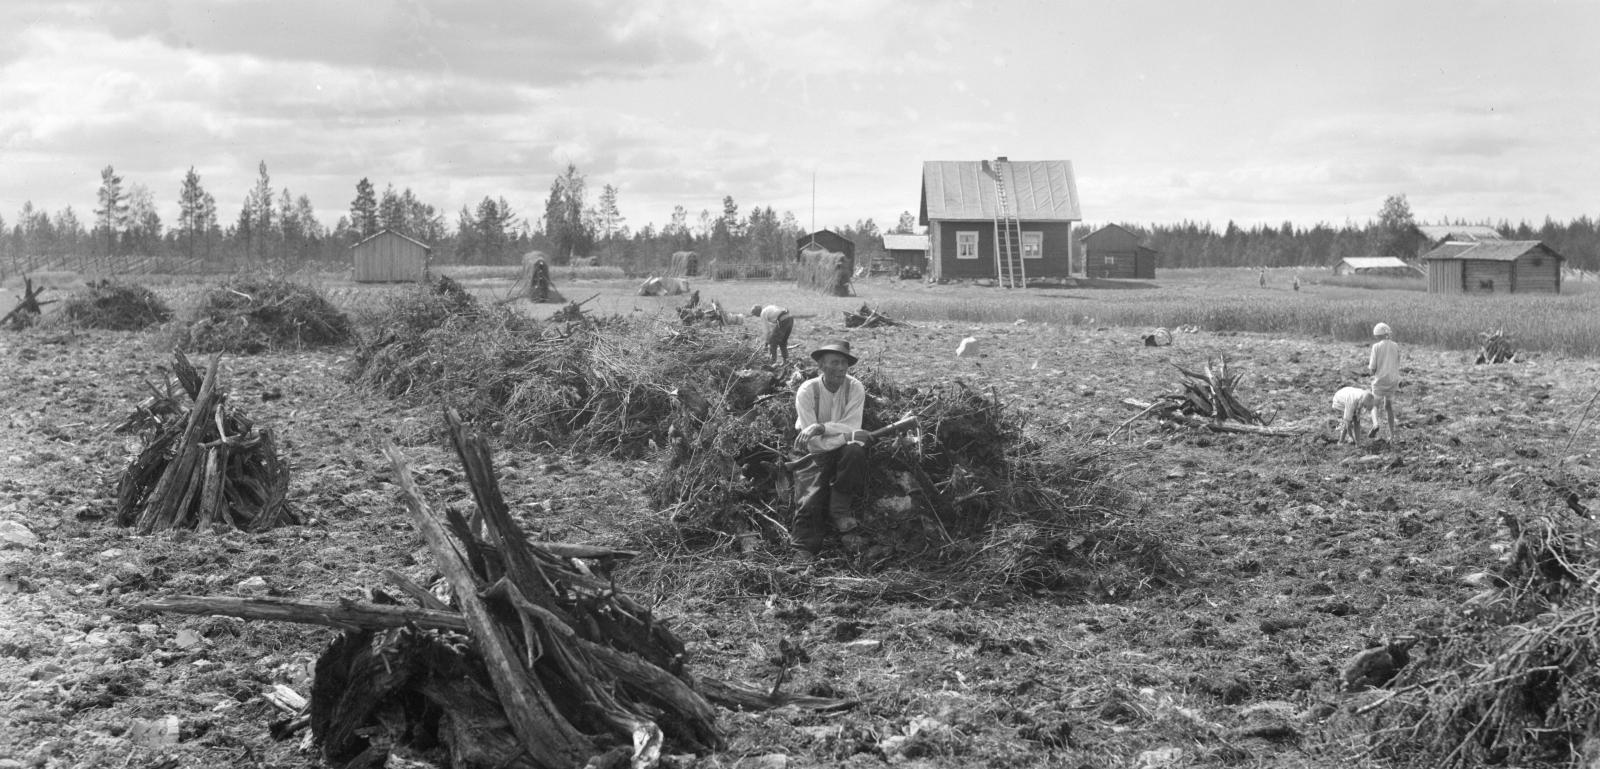 Peltoraivio vuolijokelaisella uudistilalla 1930. (Ivar Aleksander Ekström / Varkauden museo)